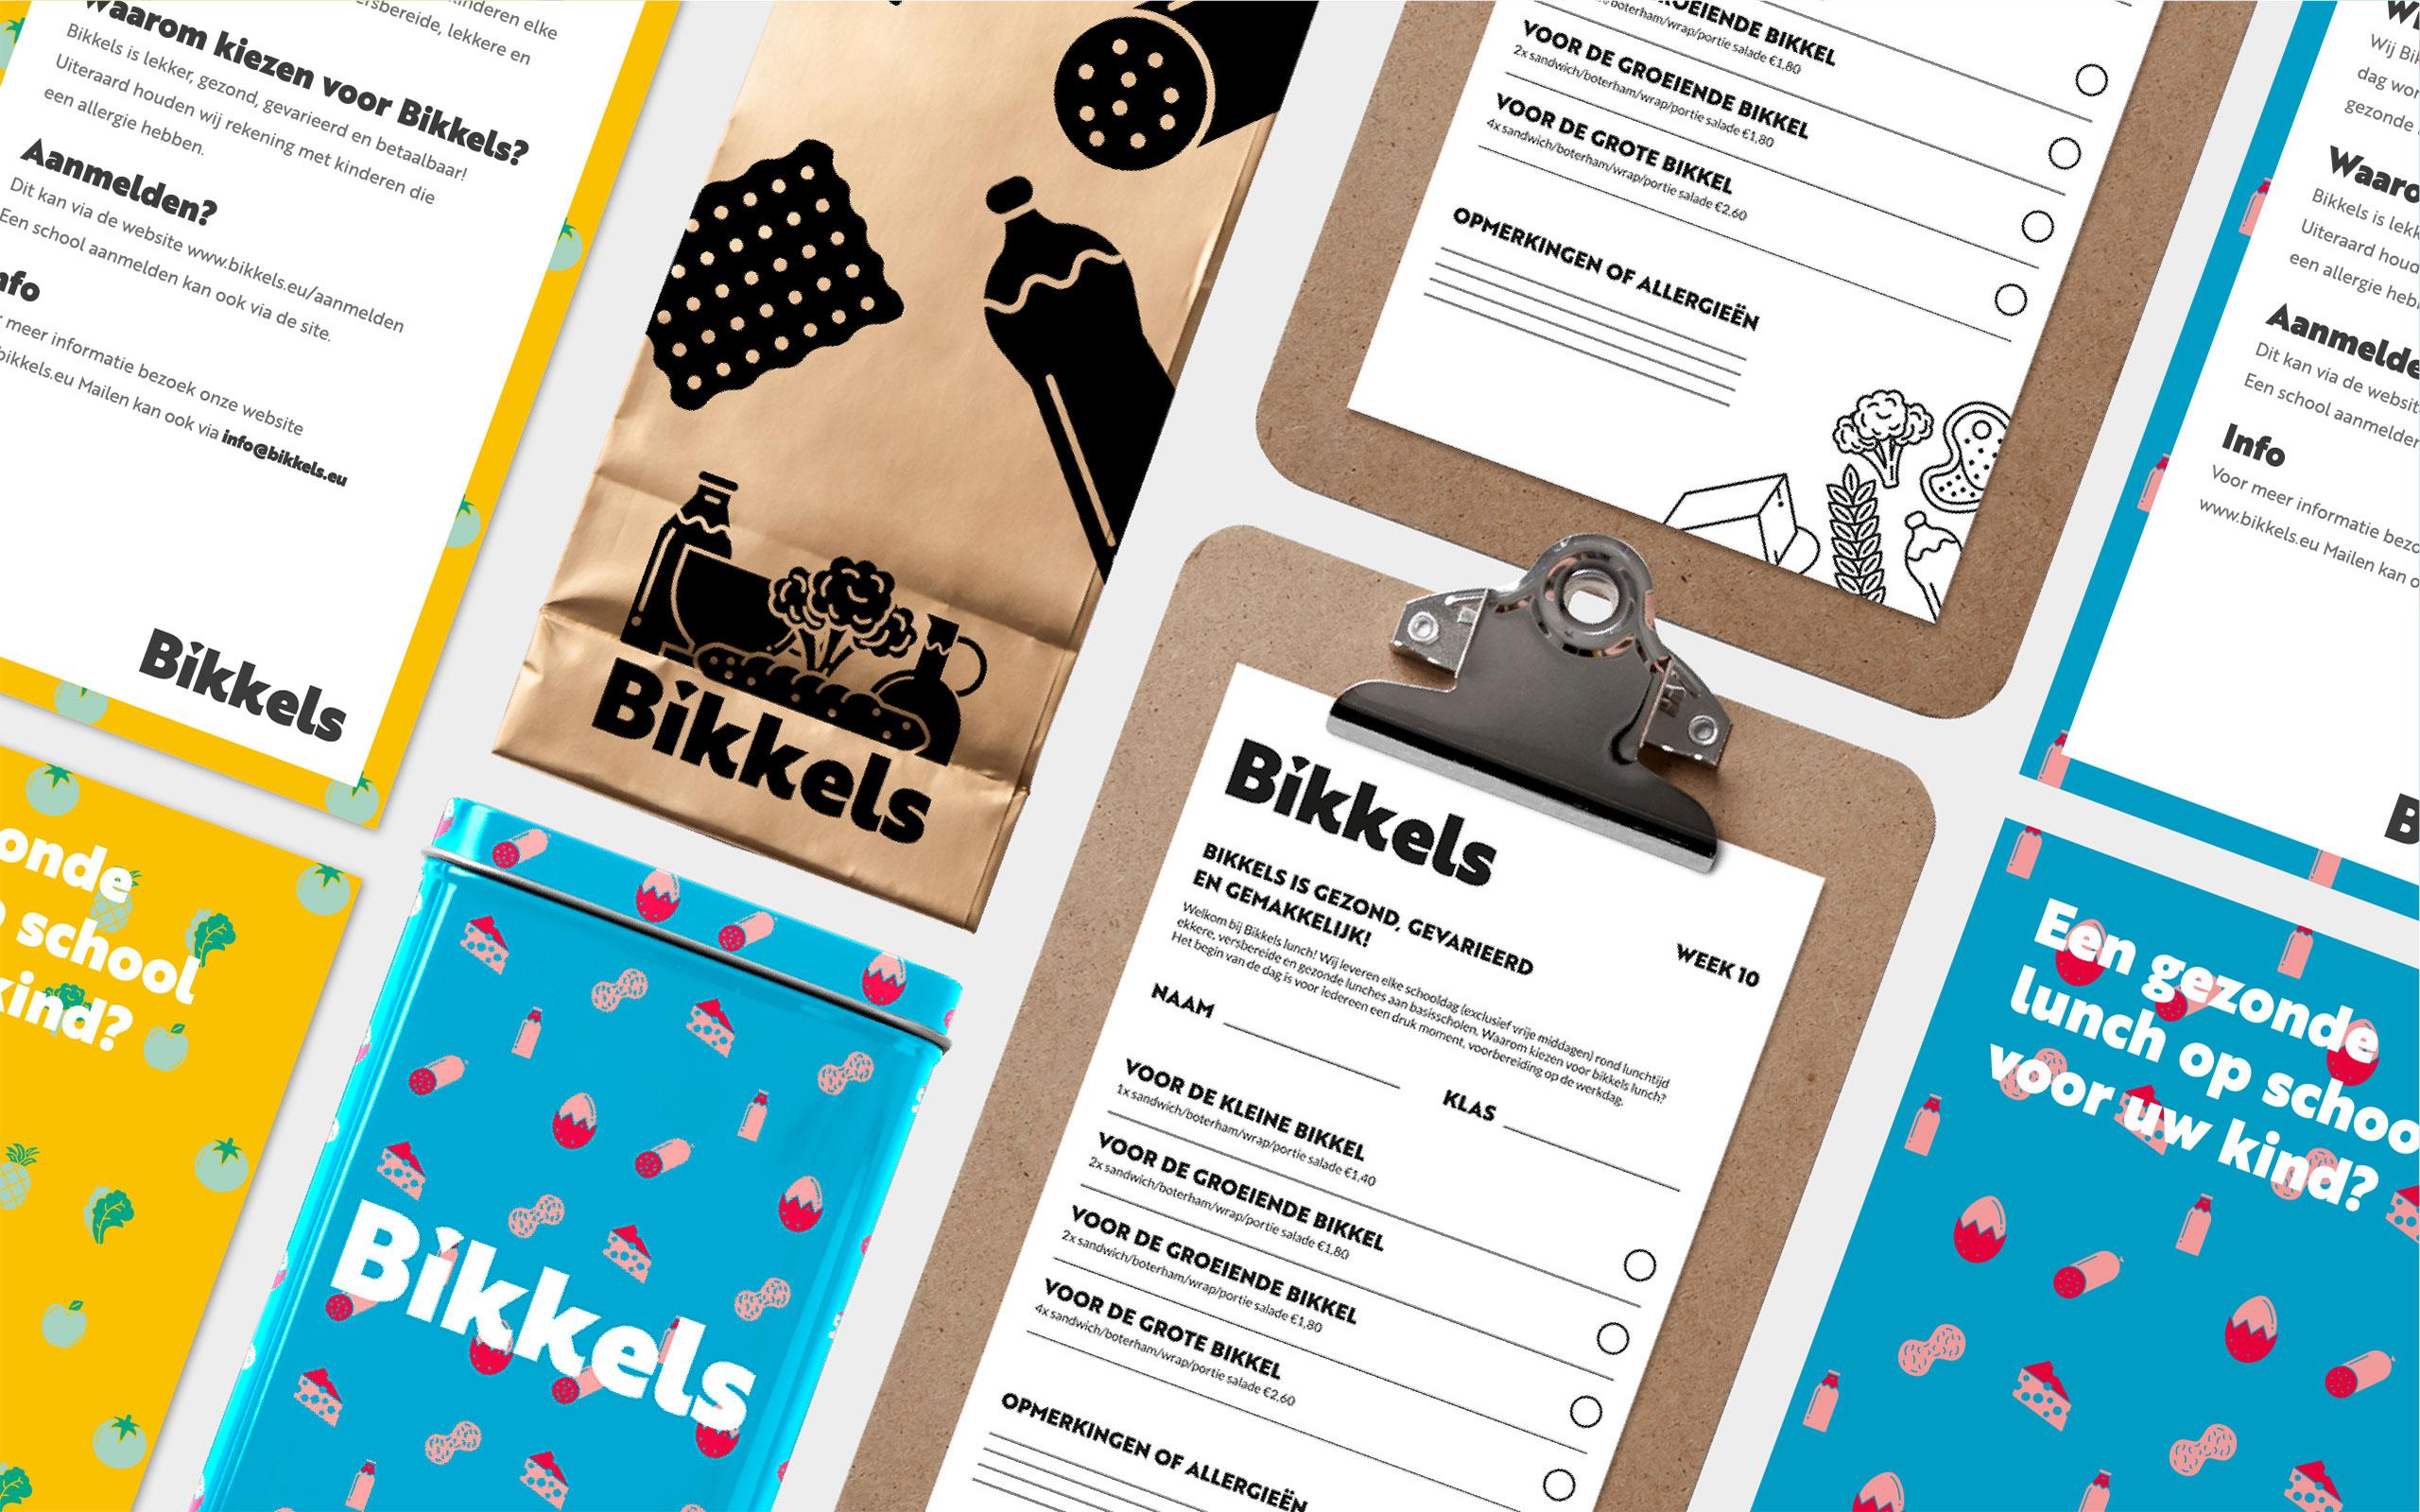 BIKKELS_COVER